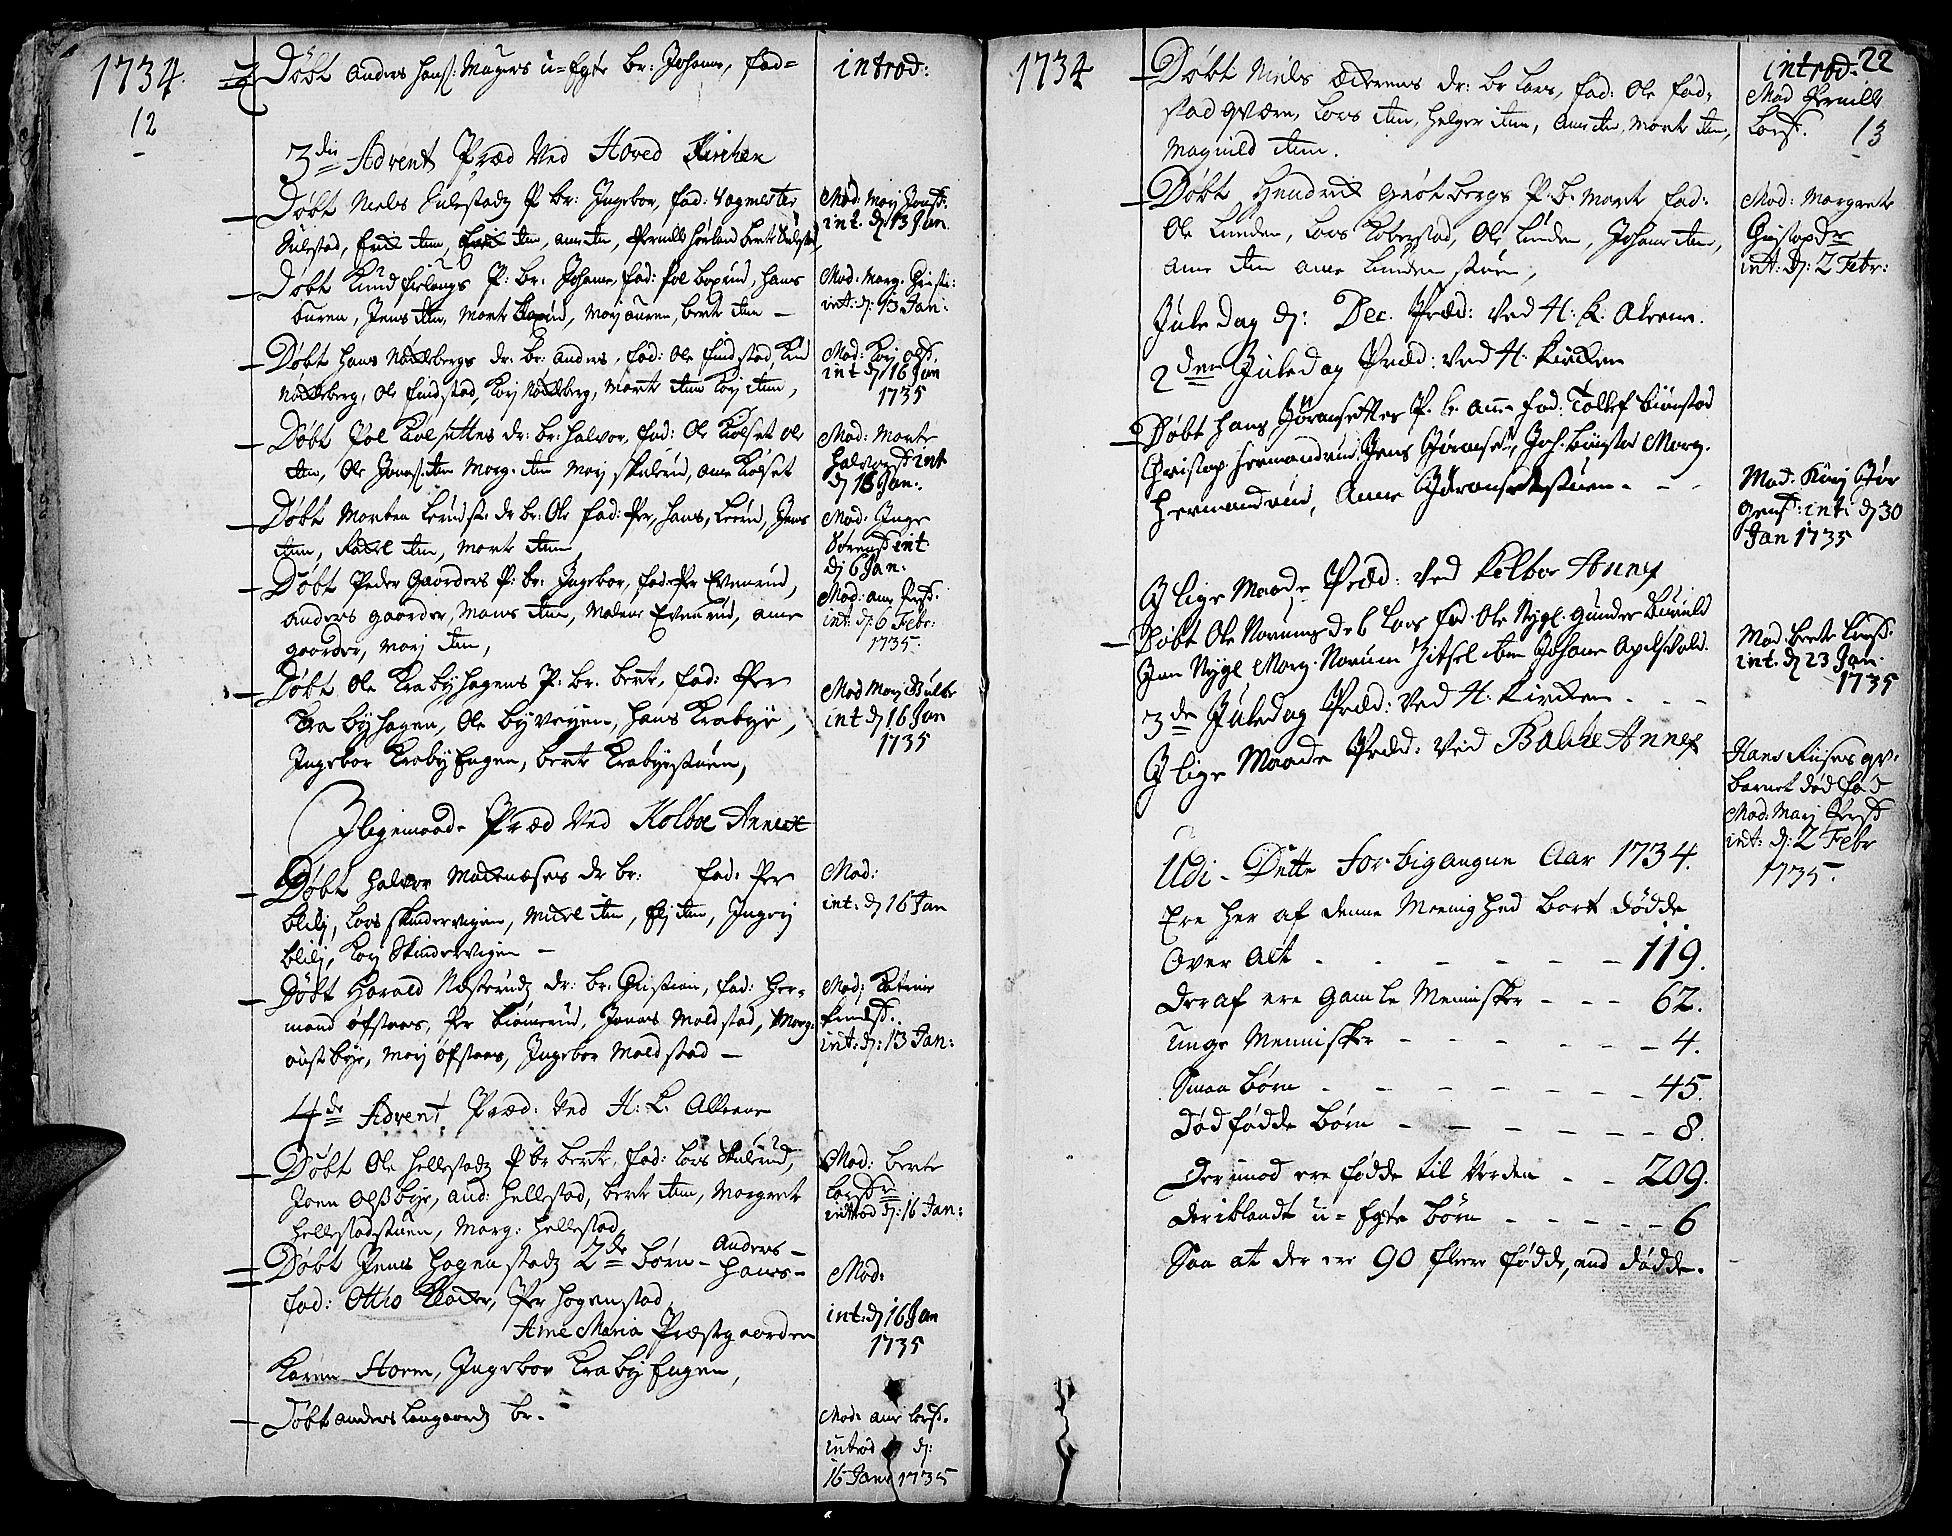 SAH, Toten prestekontor, Ministerialbok nr. 3, 1734-1751, s. 12-13